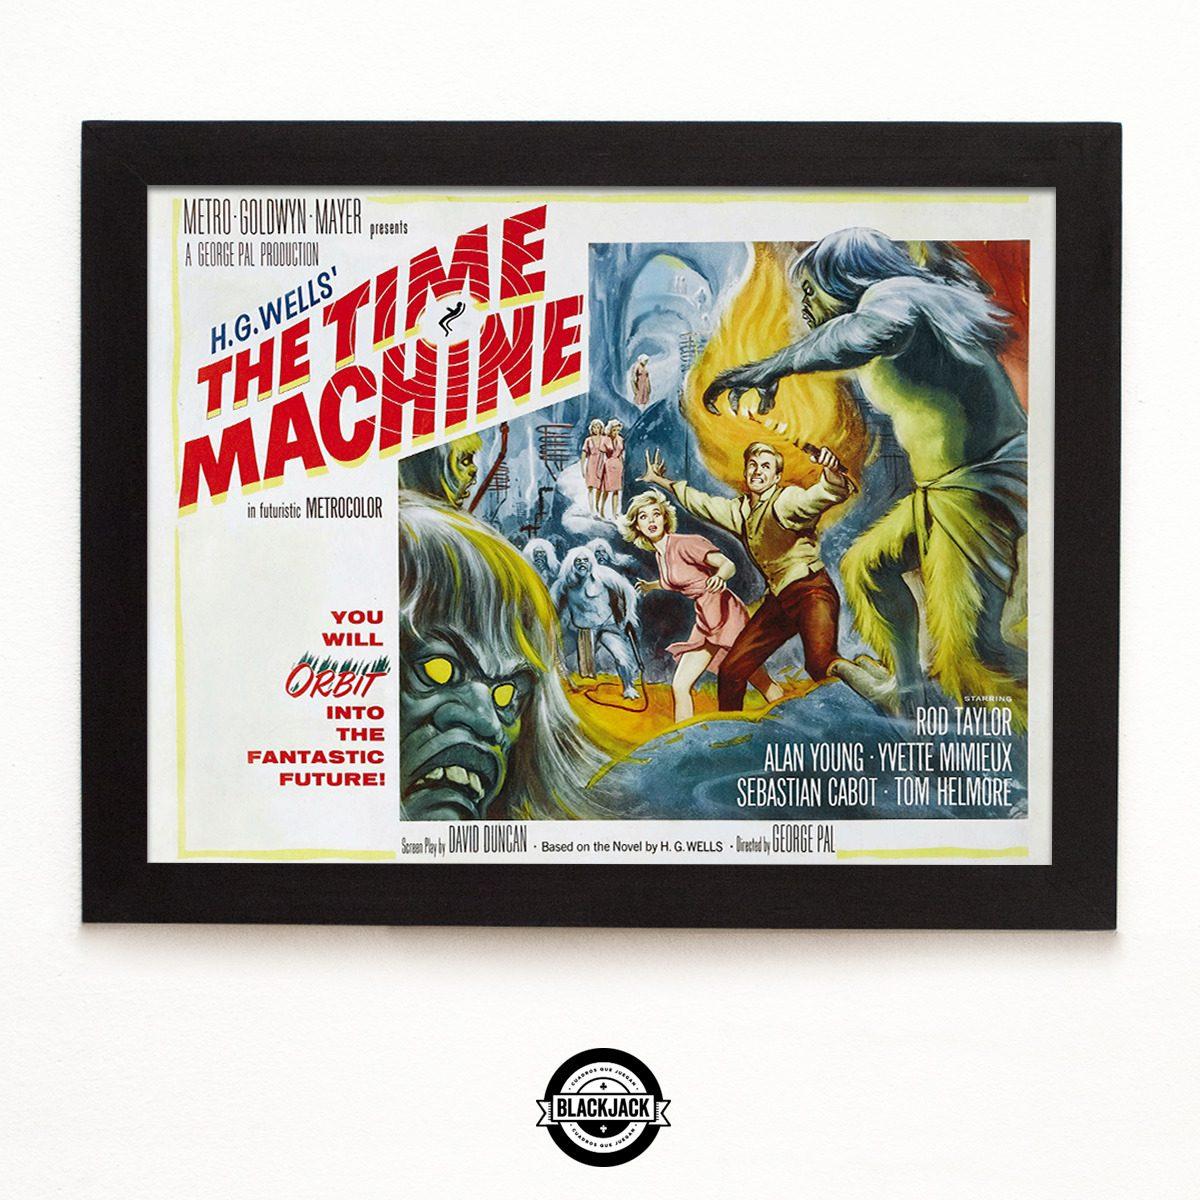 Cuadro Madera Relic 30x40 The Time Machine Pelicula Cine - $ 500,00 ...